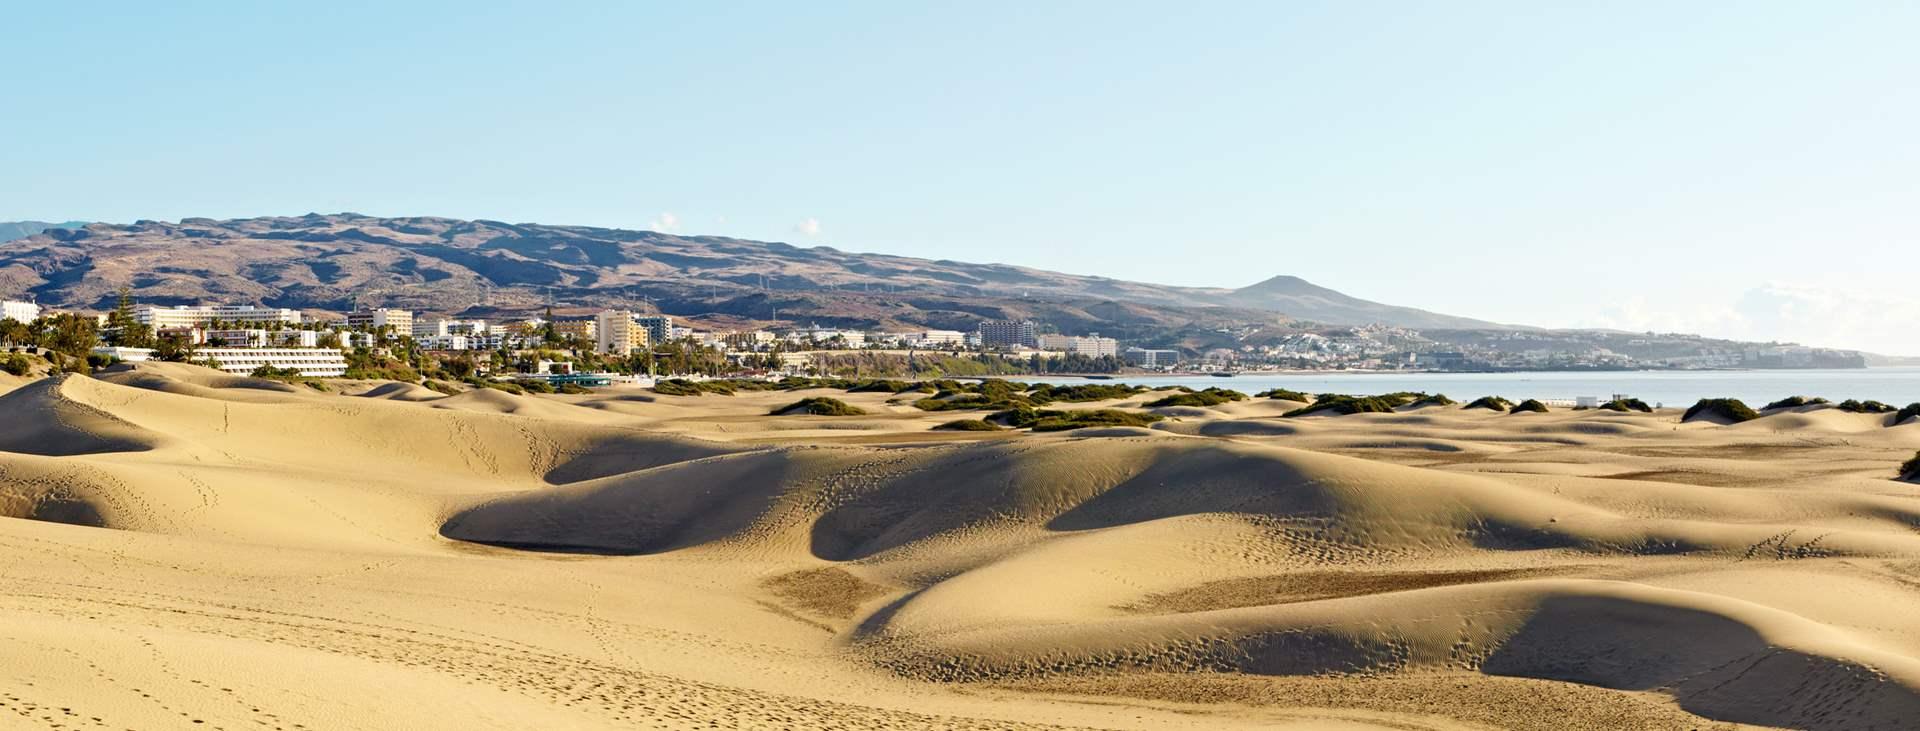 Bestill en reise med Ving til Gran Canaria